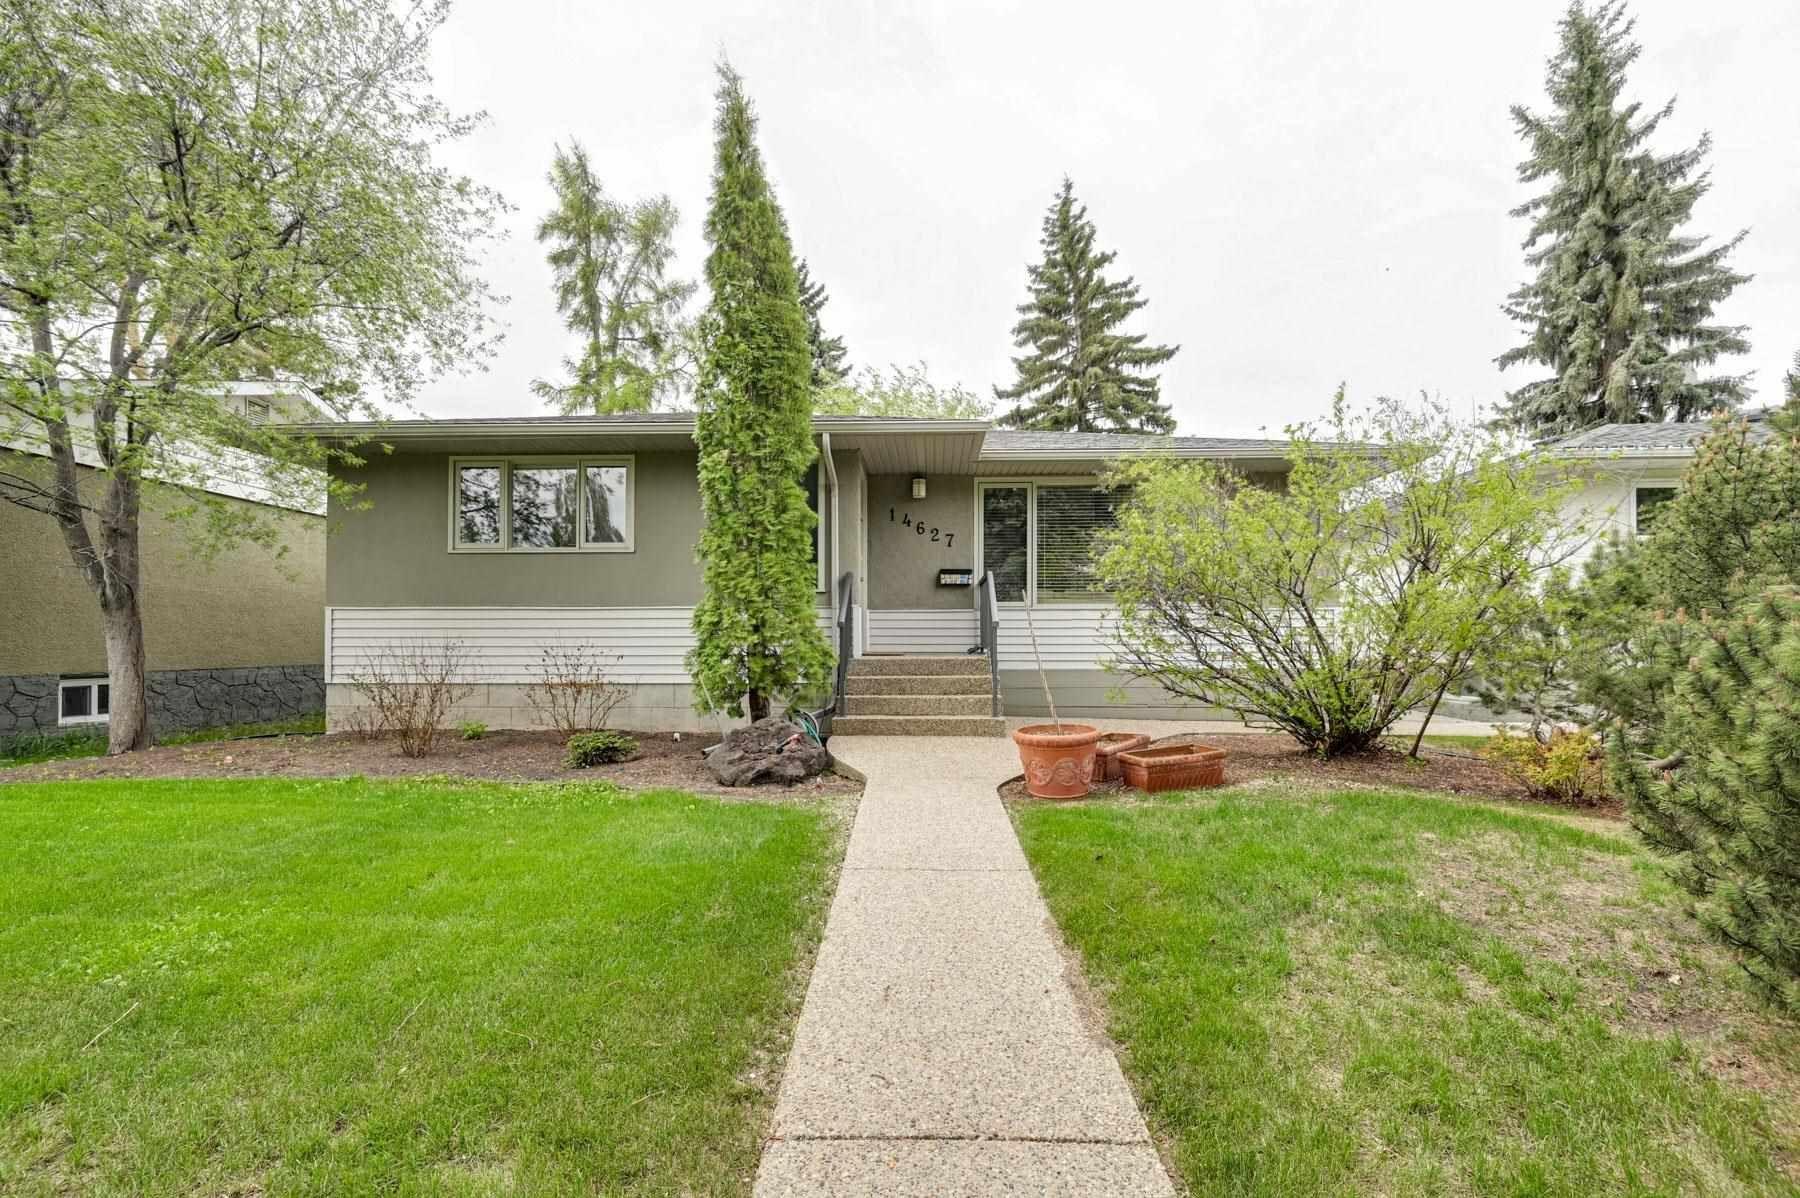 Main Photo: 14627 88 Avenue in Edmonton: Zone 10 House for sale : MLS®# E4246378